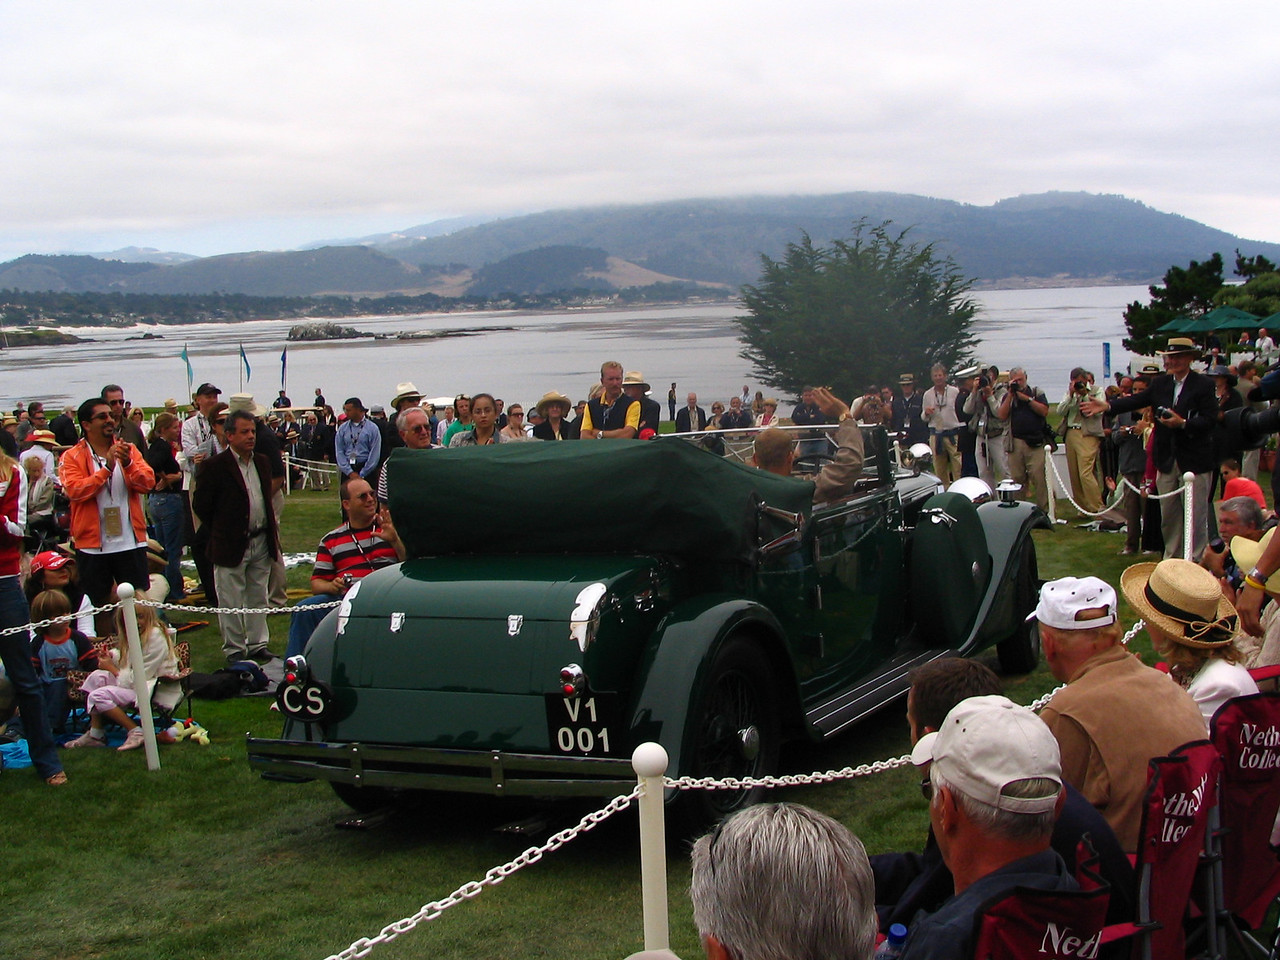 Chairman's Trophy Winner -- 1932 Tatra 80 Cabriolet owned by Evzen Majoros from Prague, Czech Republic